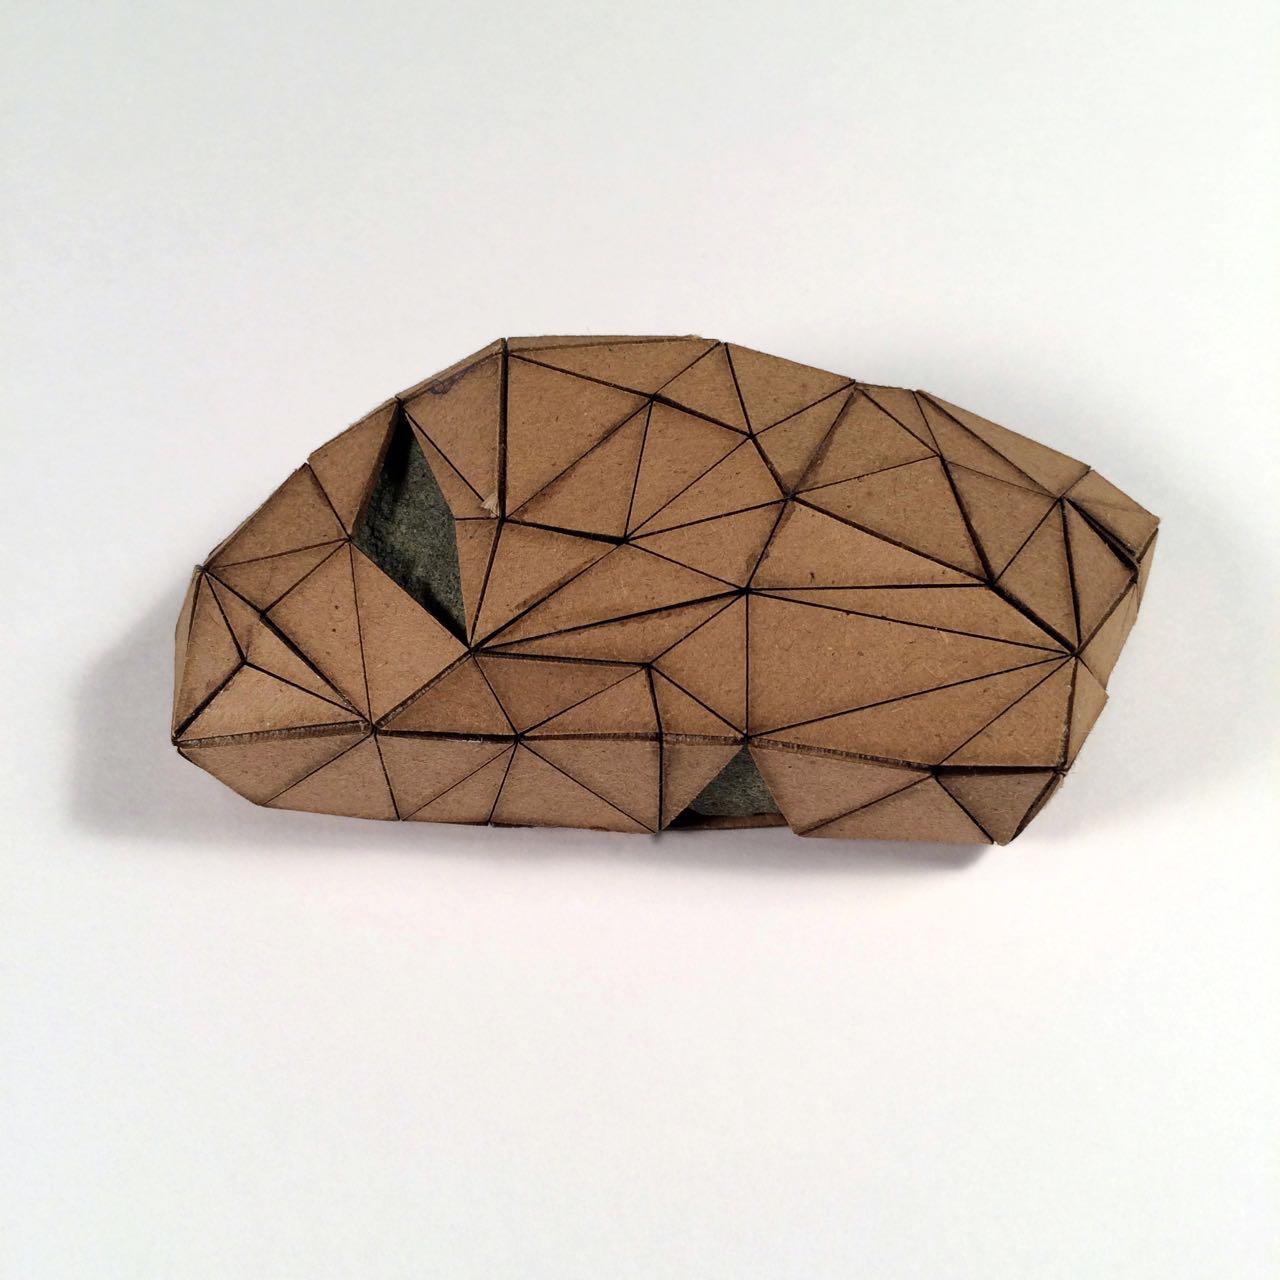 (Front view) 041 - Boxes For Rocks, 2012, laser cut cardboard, found rocks, glue, 5cm x 4.5cm x 3cm (squarish), 250 CAD